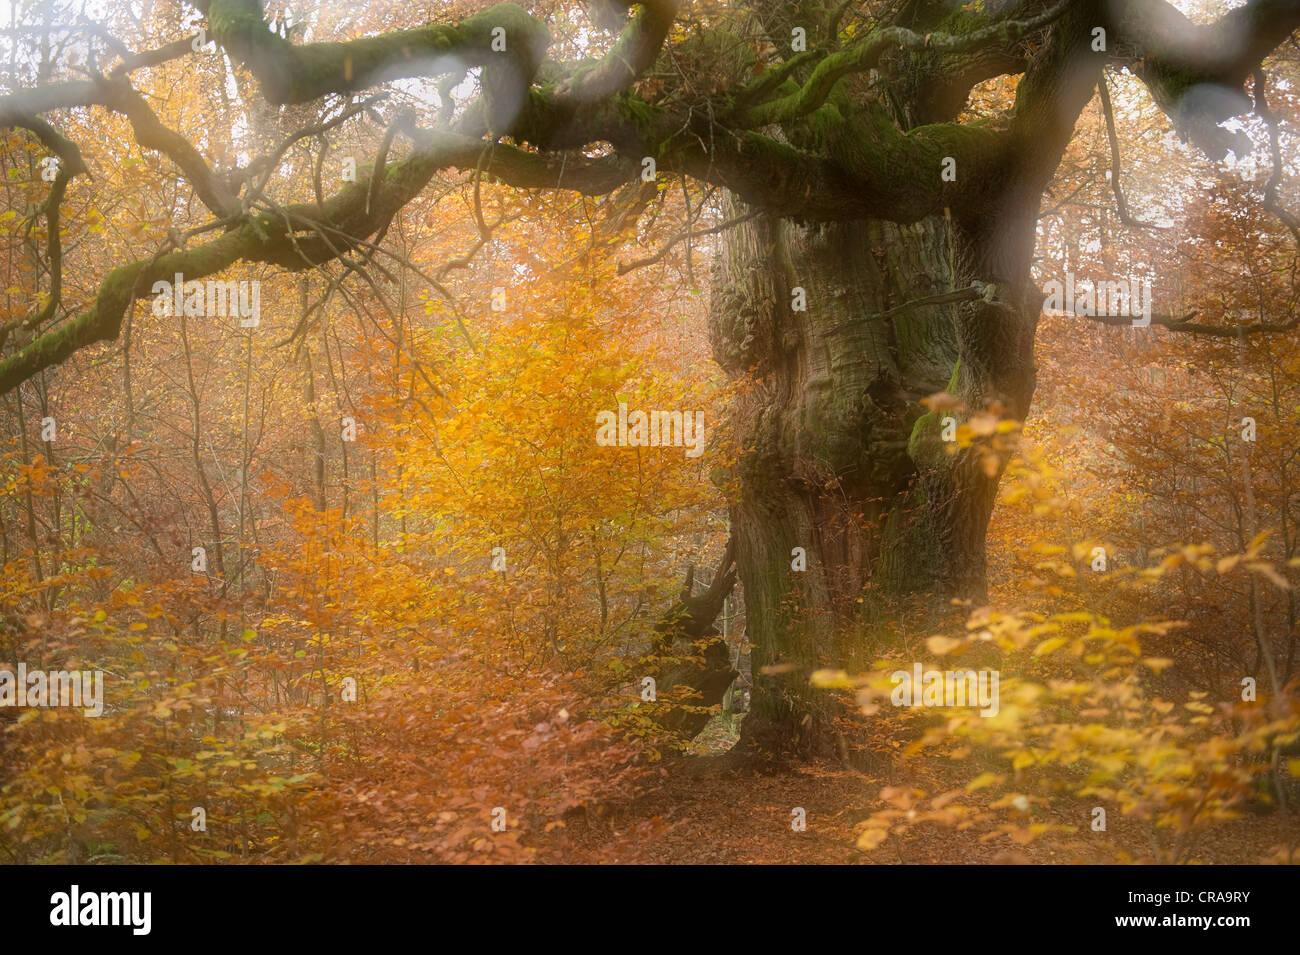 Oak (Quercus), Urwald Sababurg primeval forest, autumn, Reinhardswald, Hofgeismar, North Hesse, Germany, Europe - Stock Image